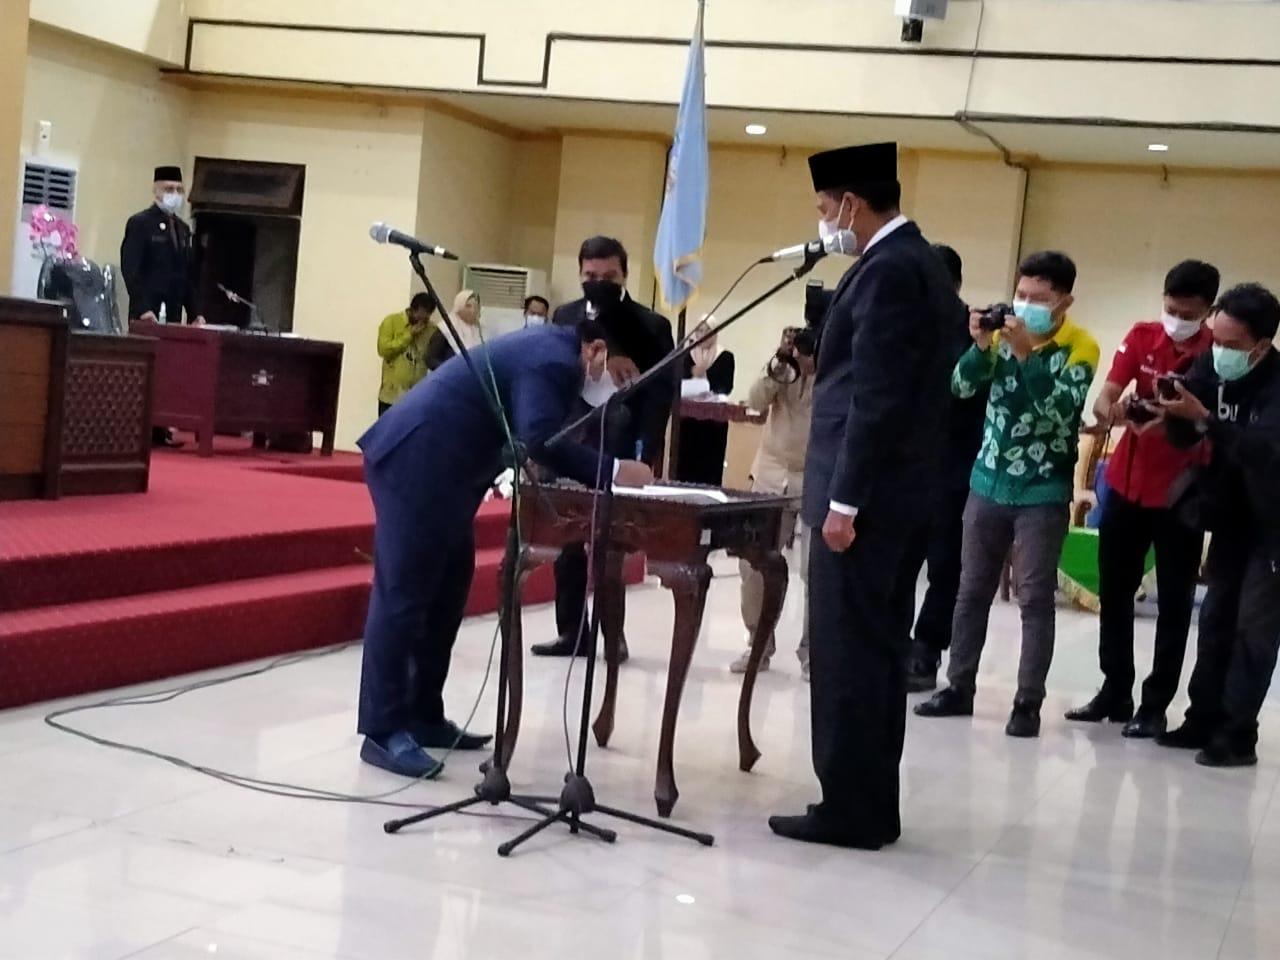 Ketua DPRD Kabupaten Banjar Pimpin Pelantikan Anggota PAW Perdana Periode 2019-2024